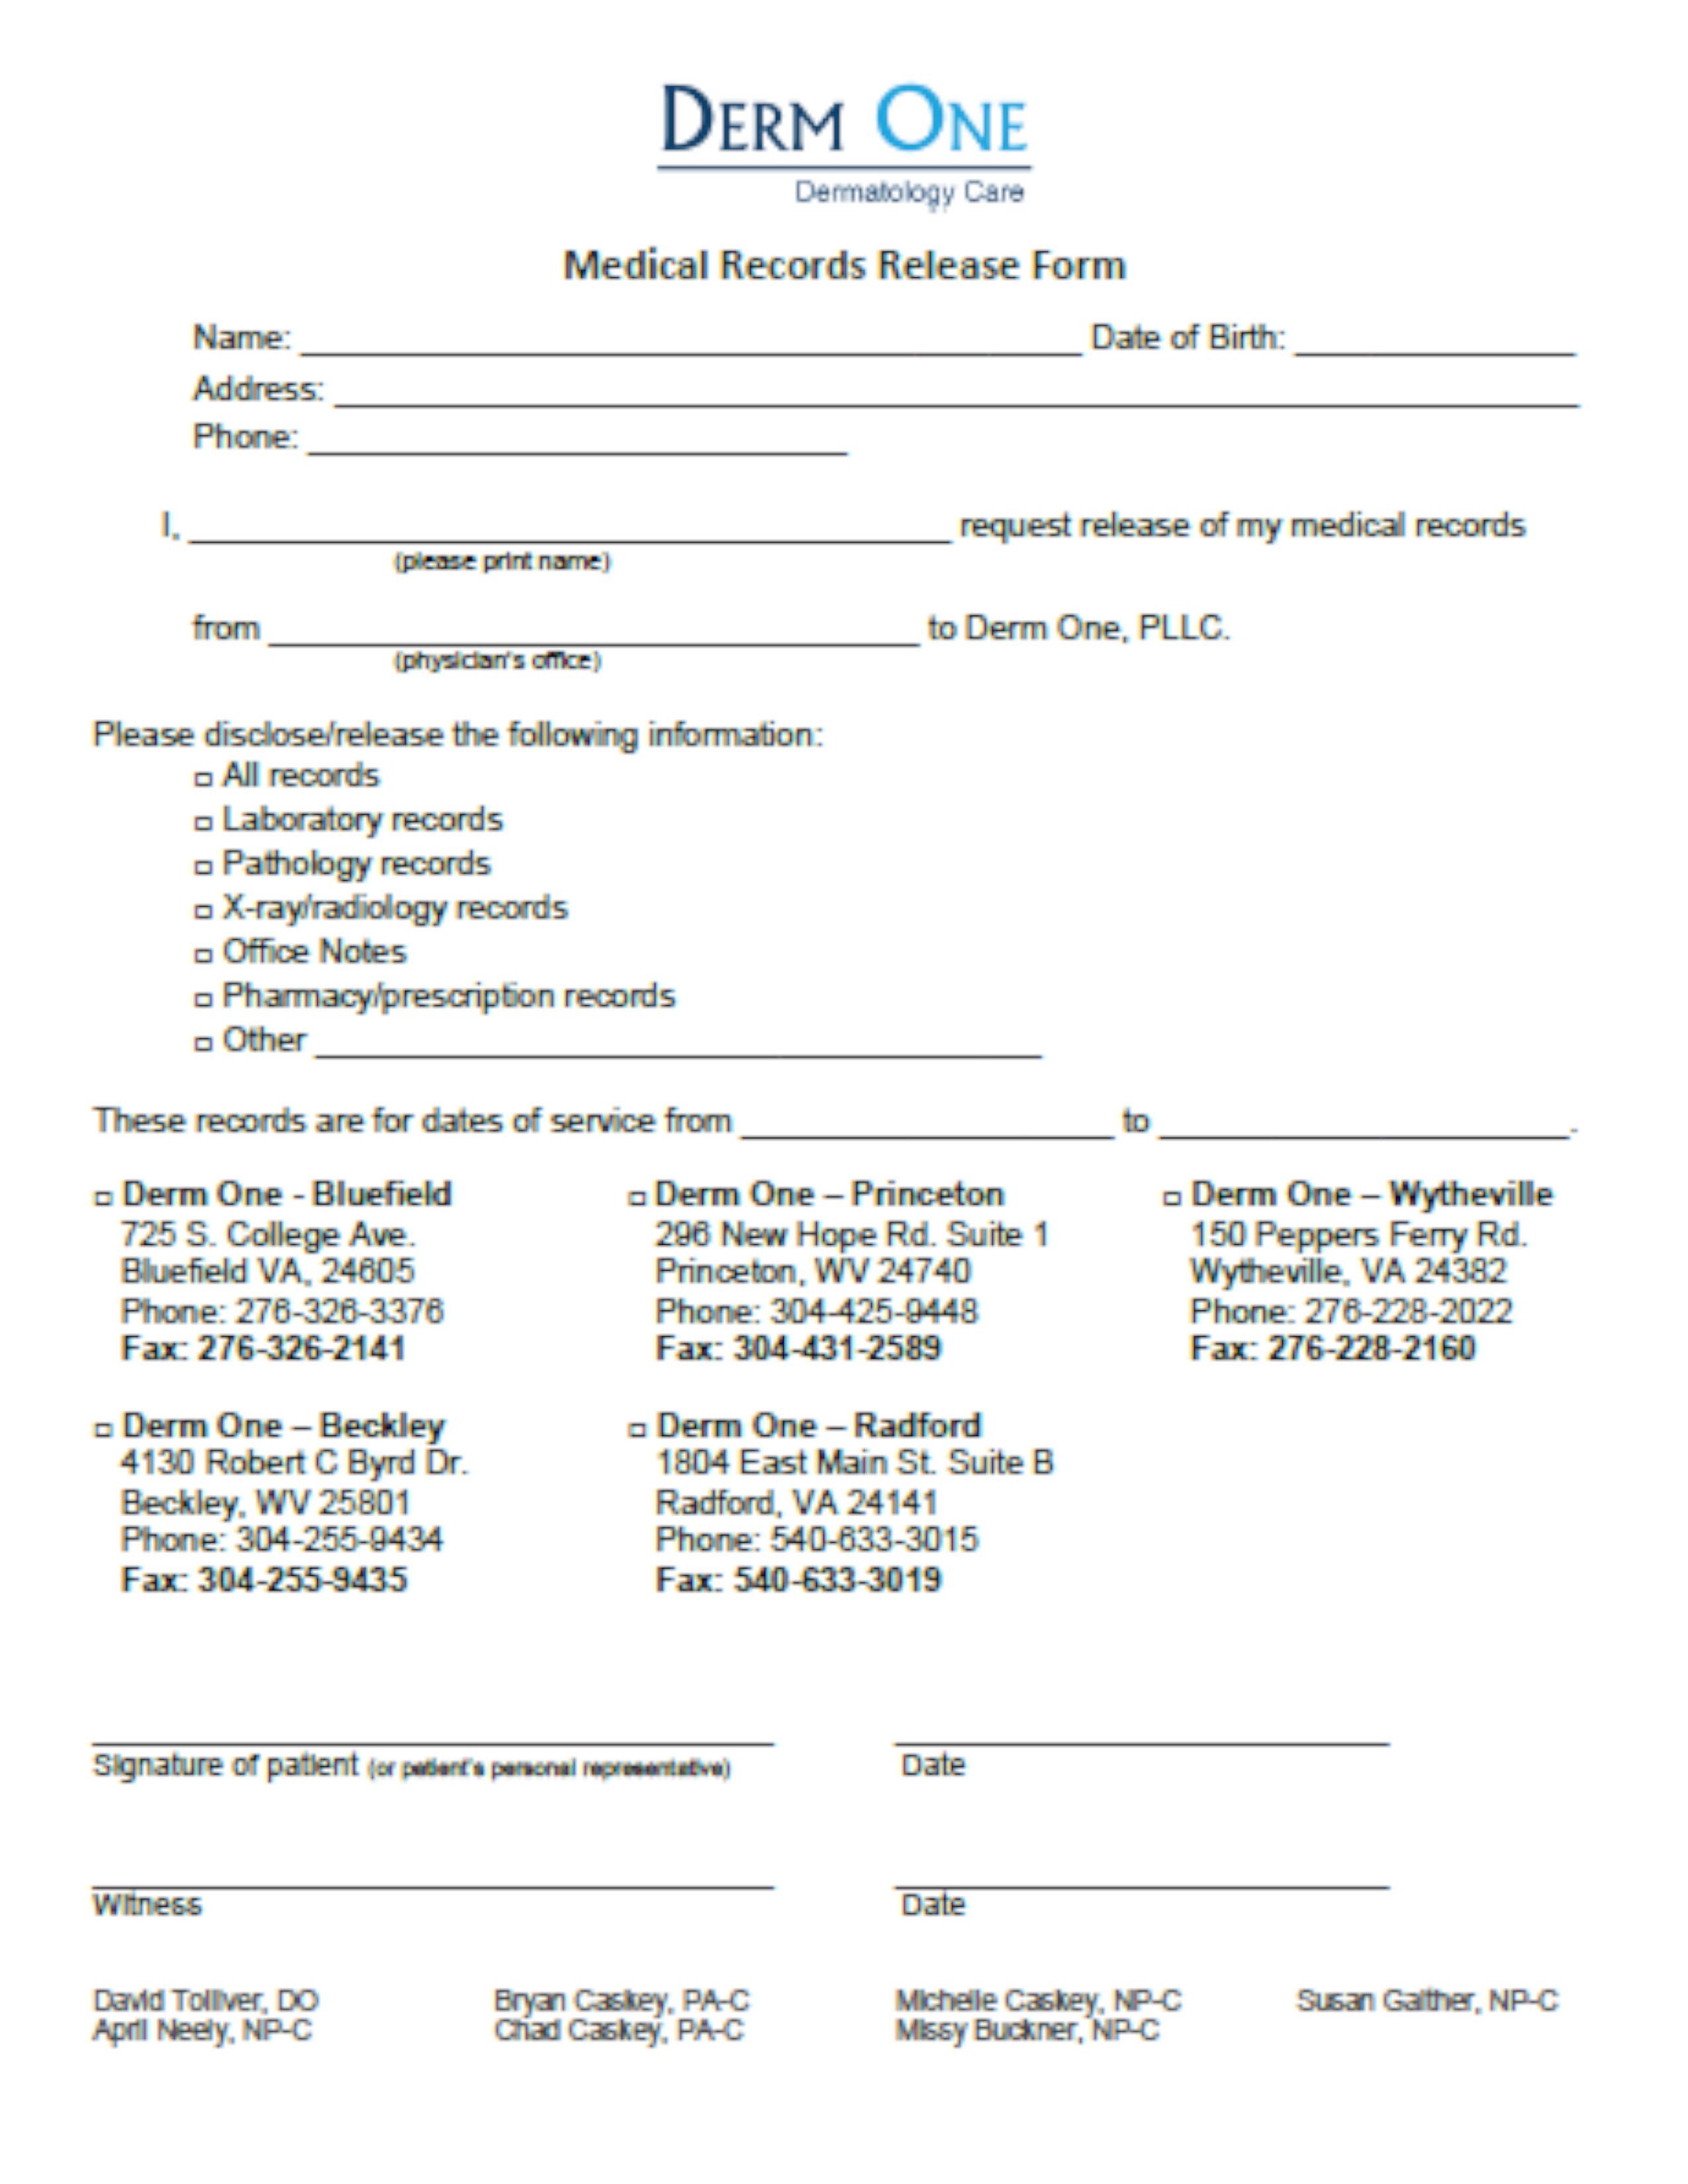 REGISTRATION FORMS – Derm One, PLLC